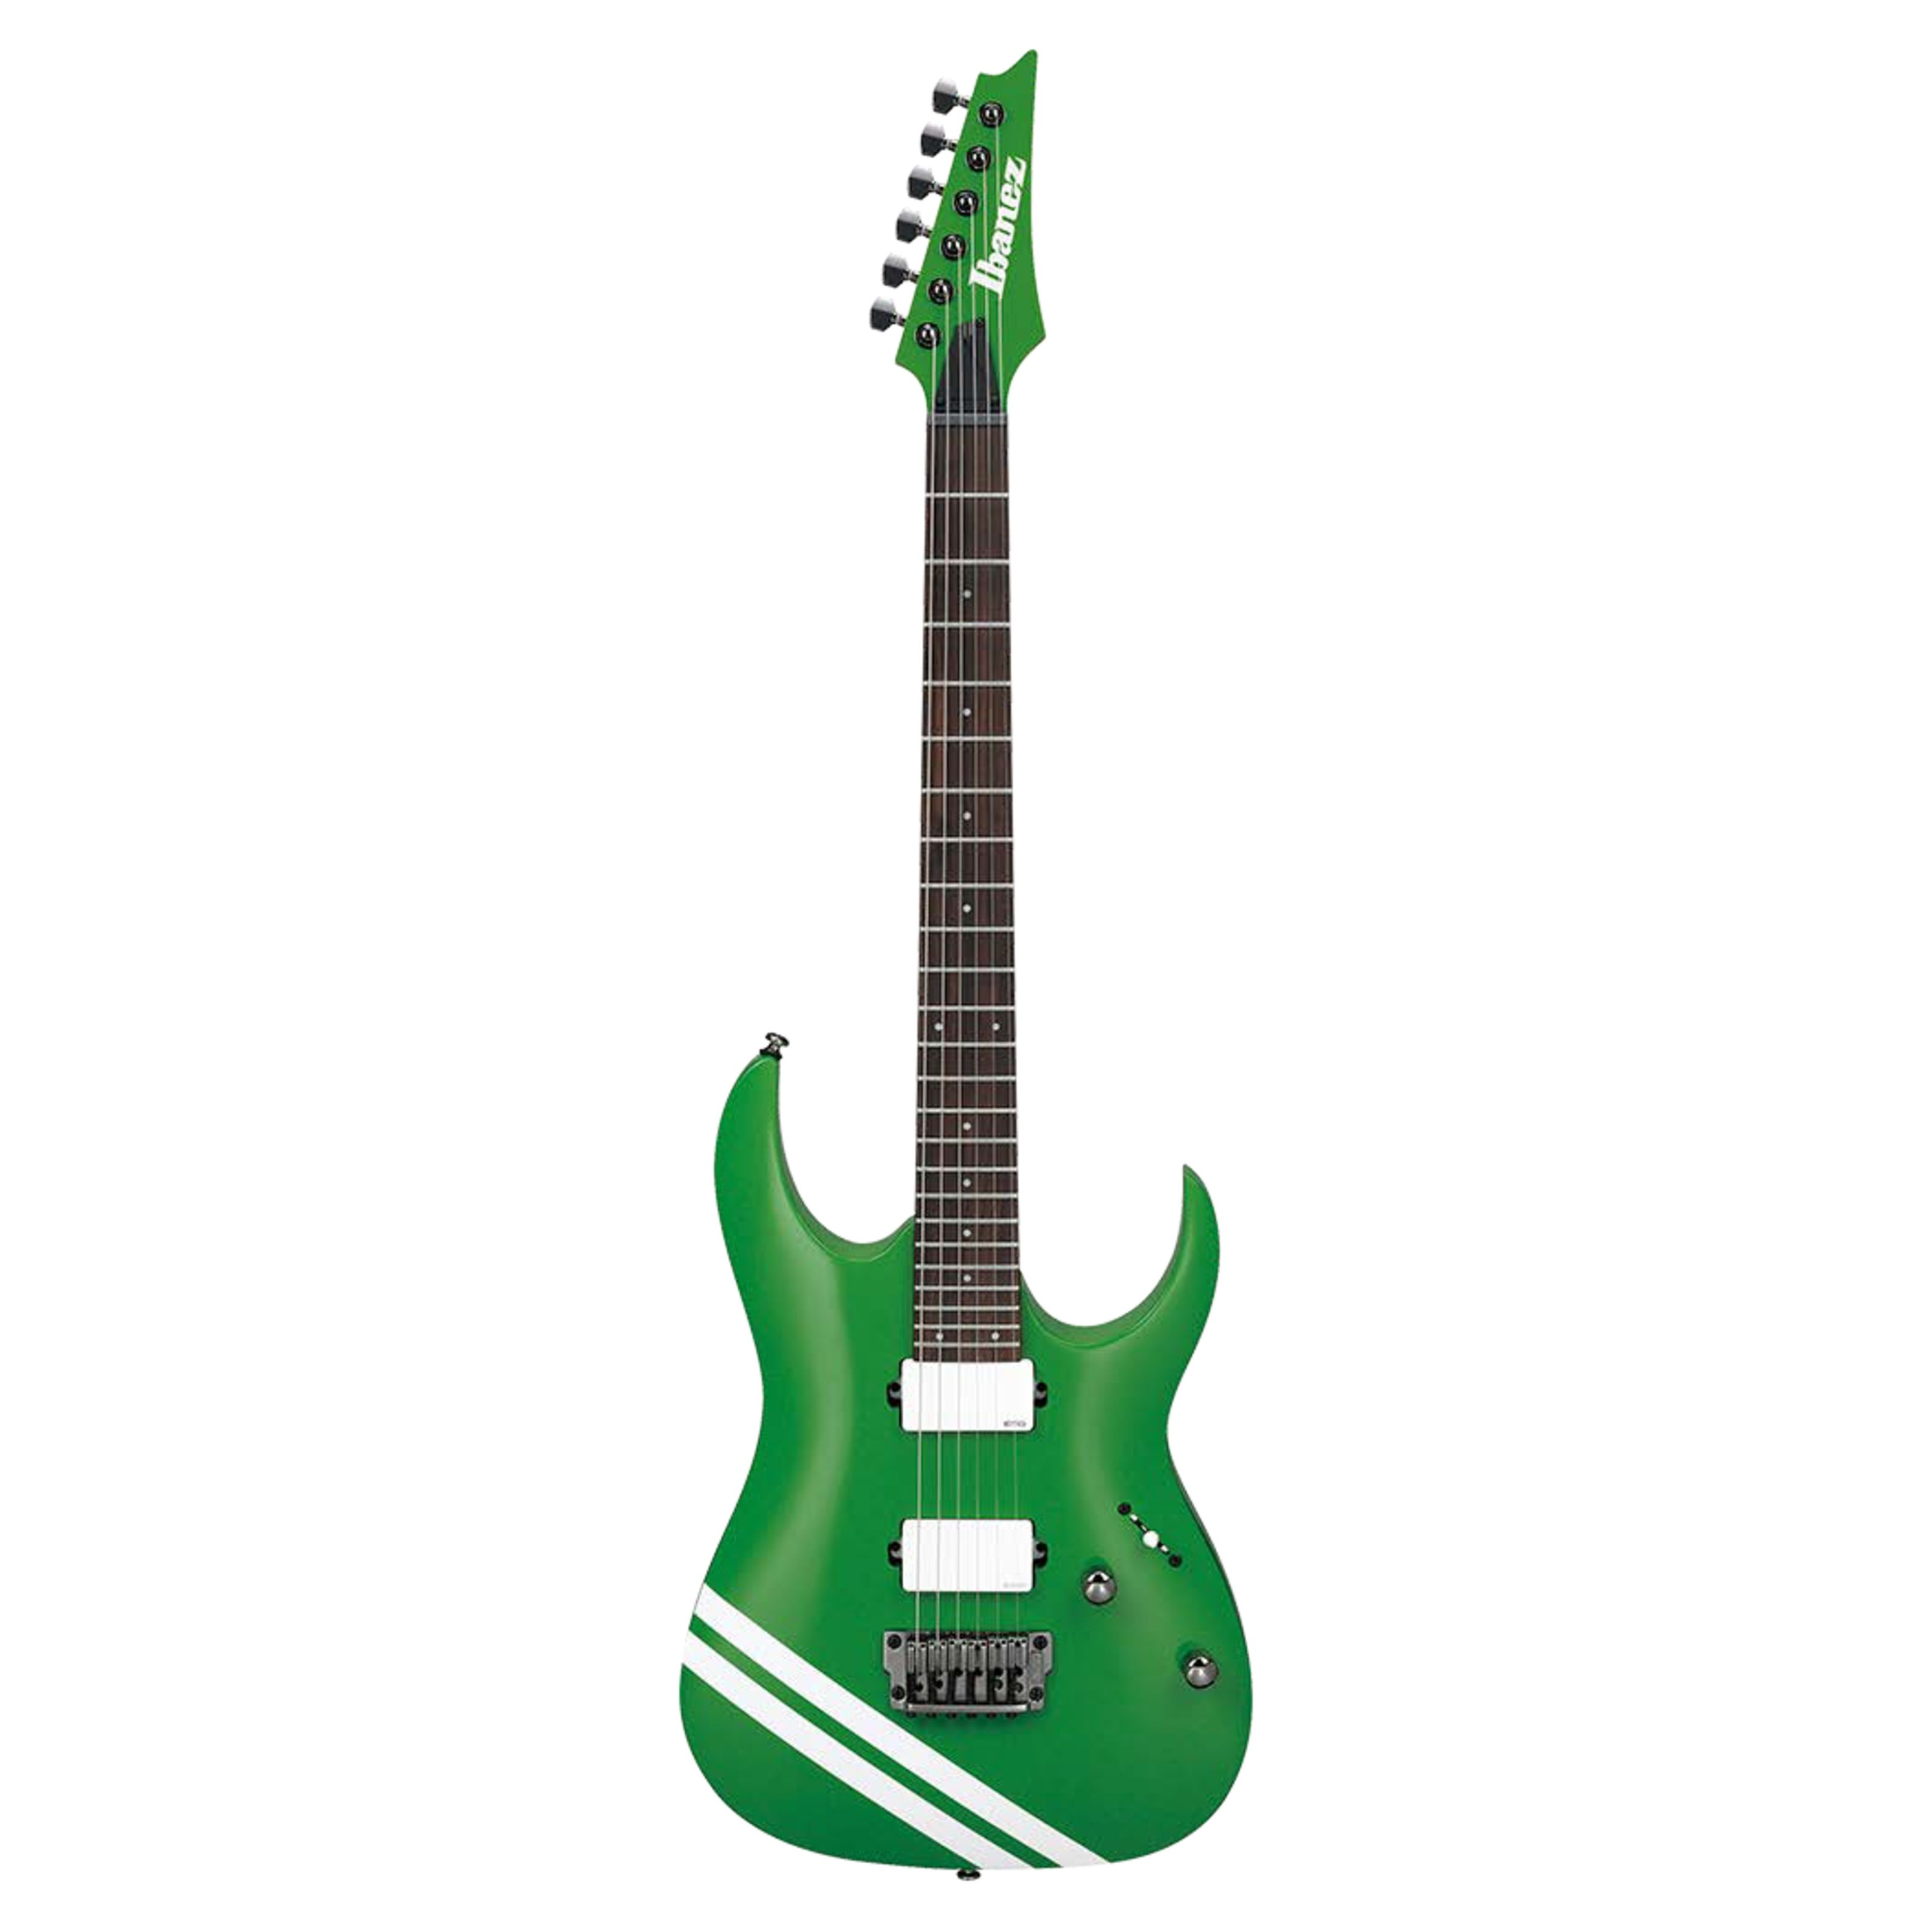 Ibanez - JB Brubaker JBBM20-GR Green